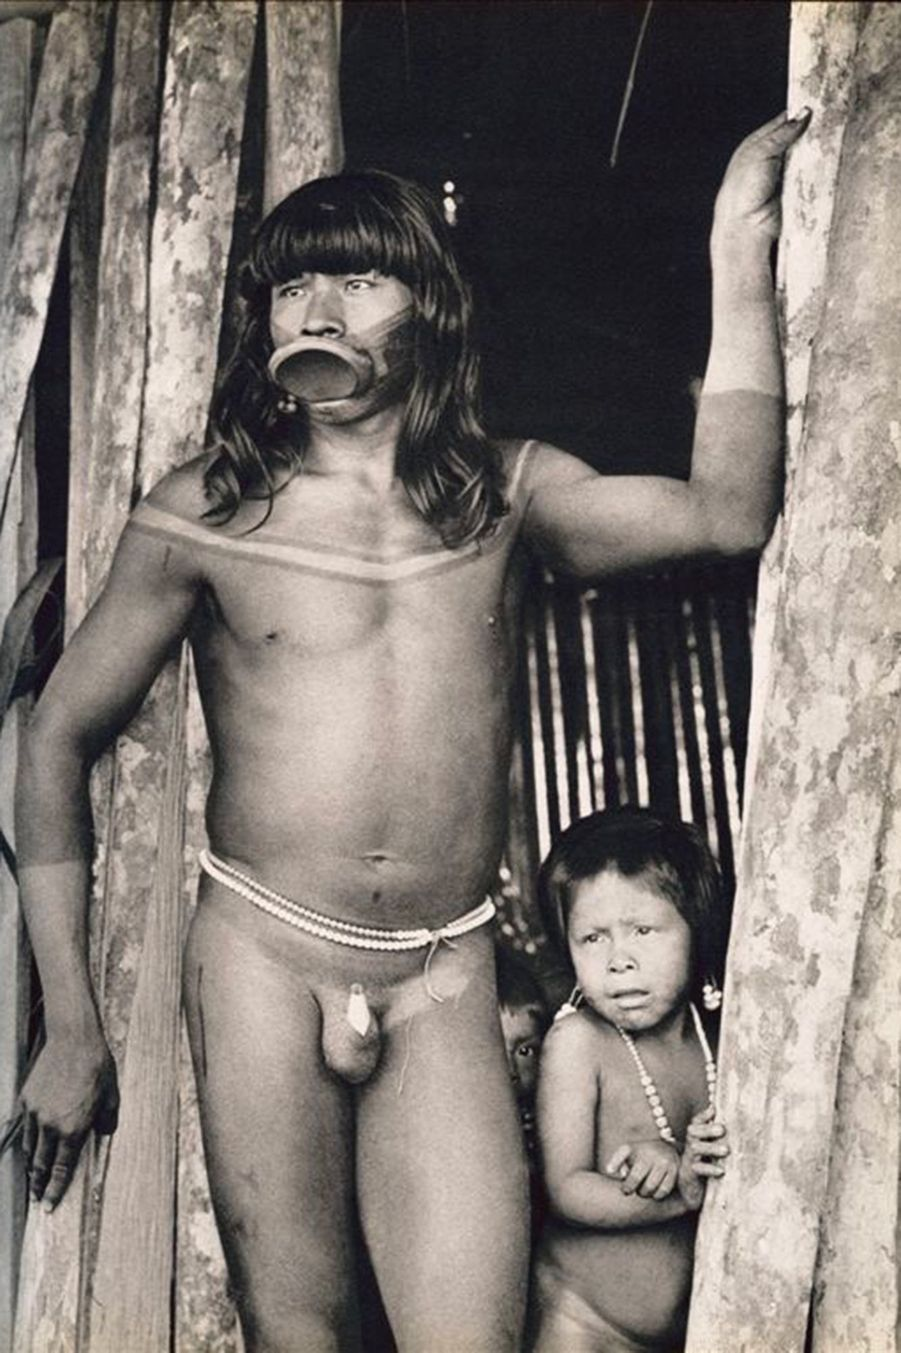 Raoni jeune, vers 1962